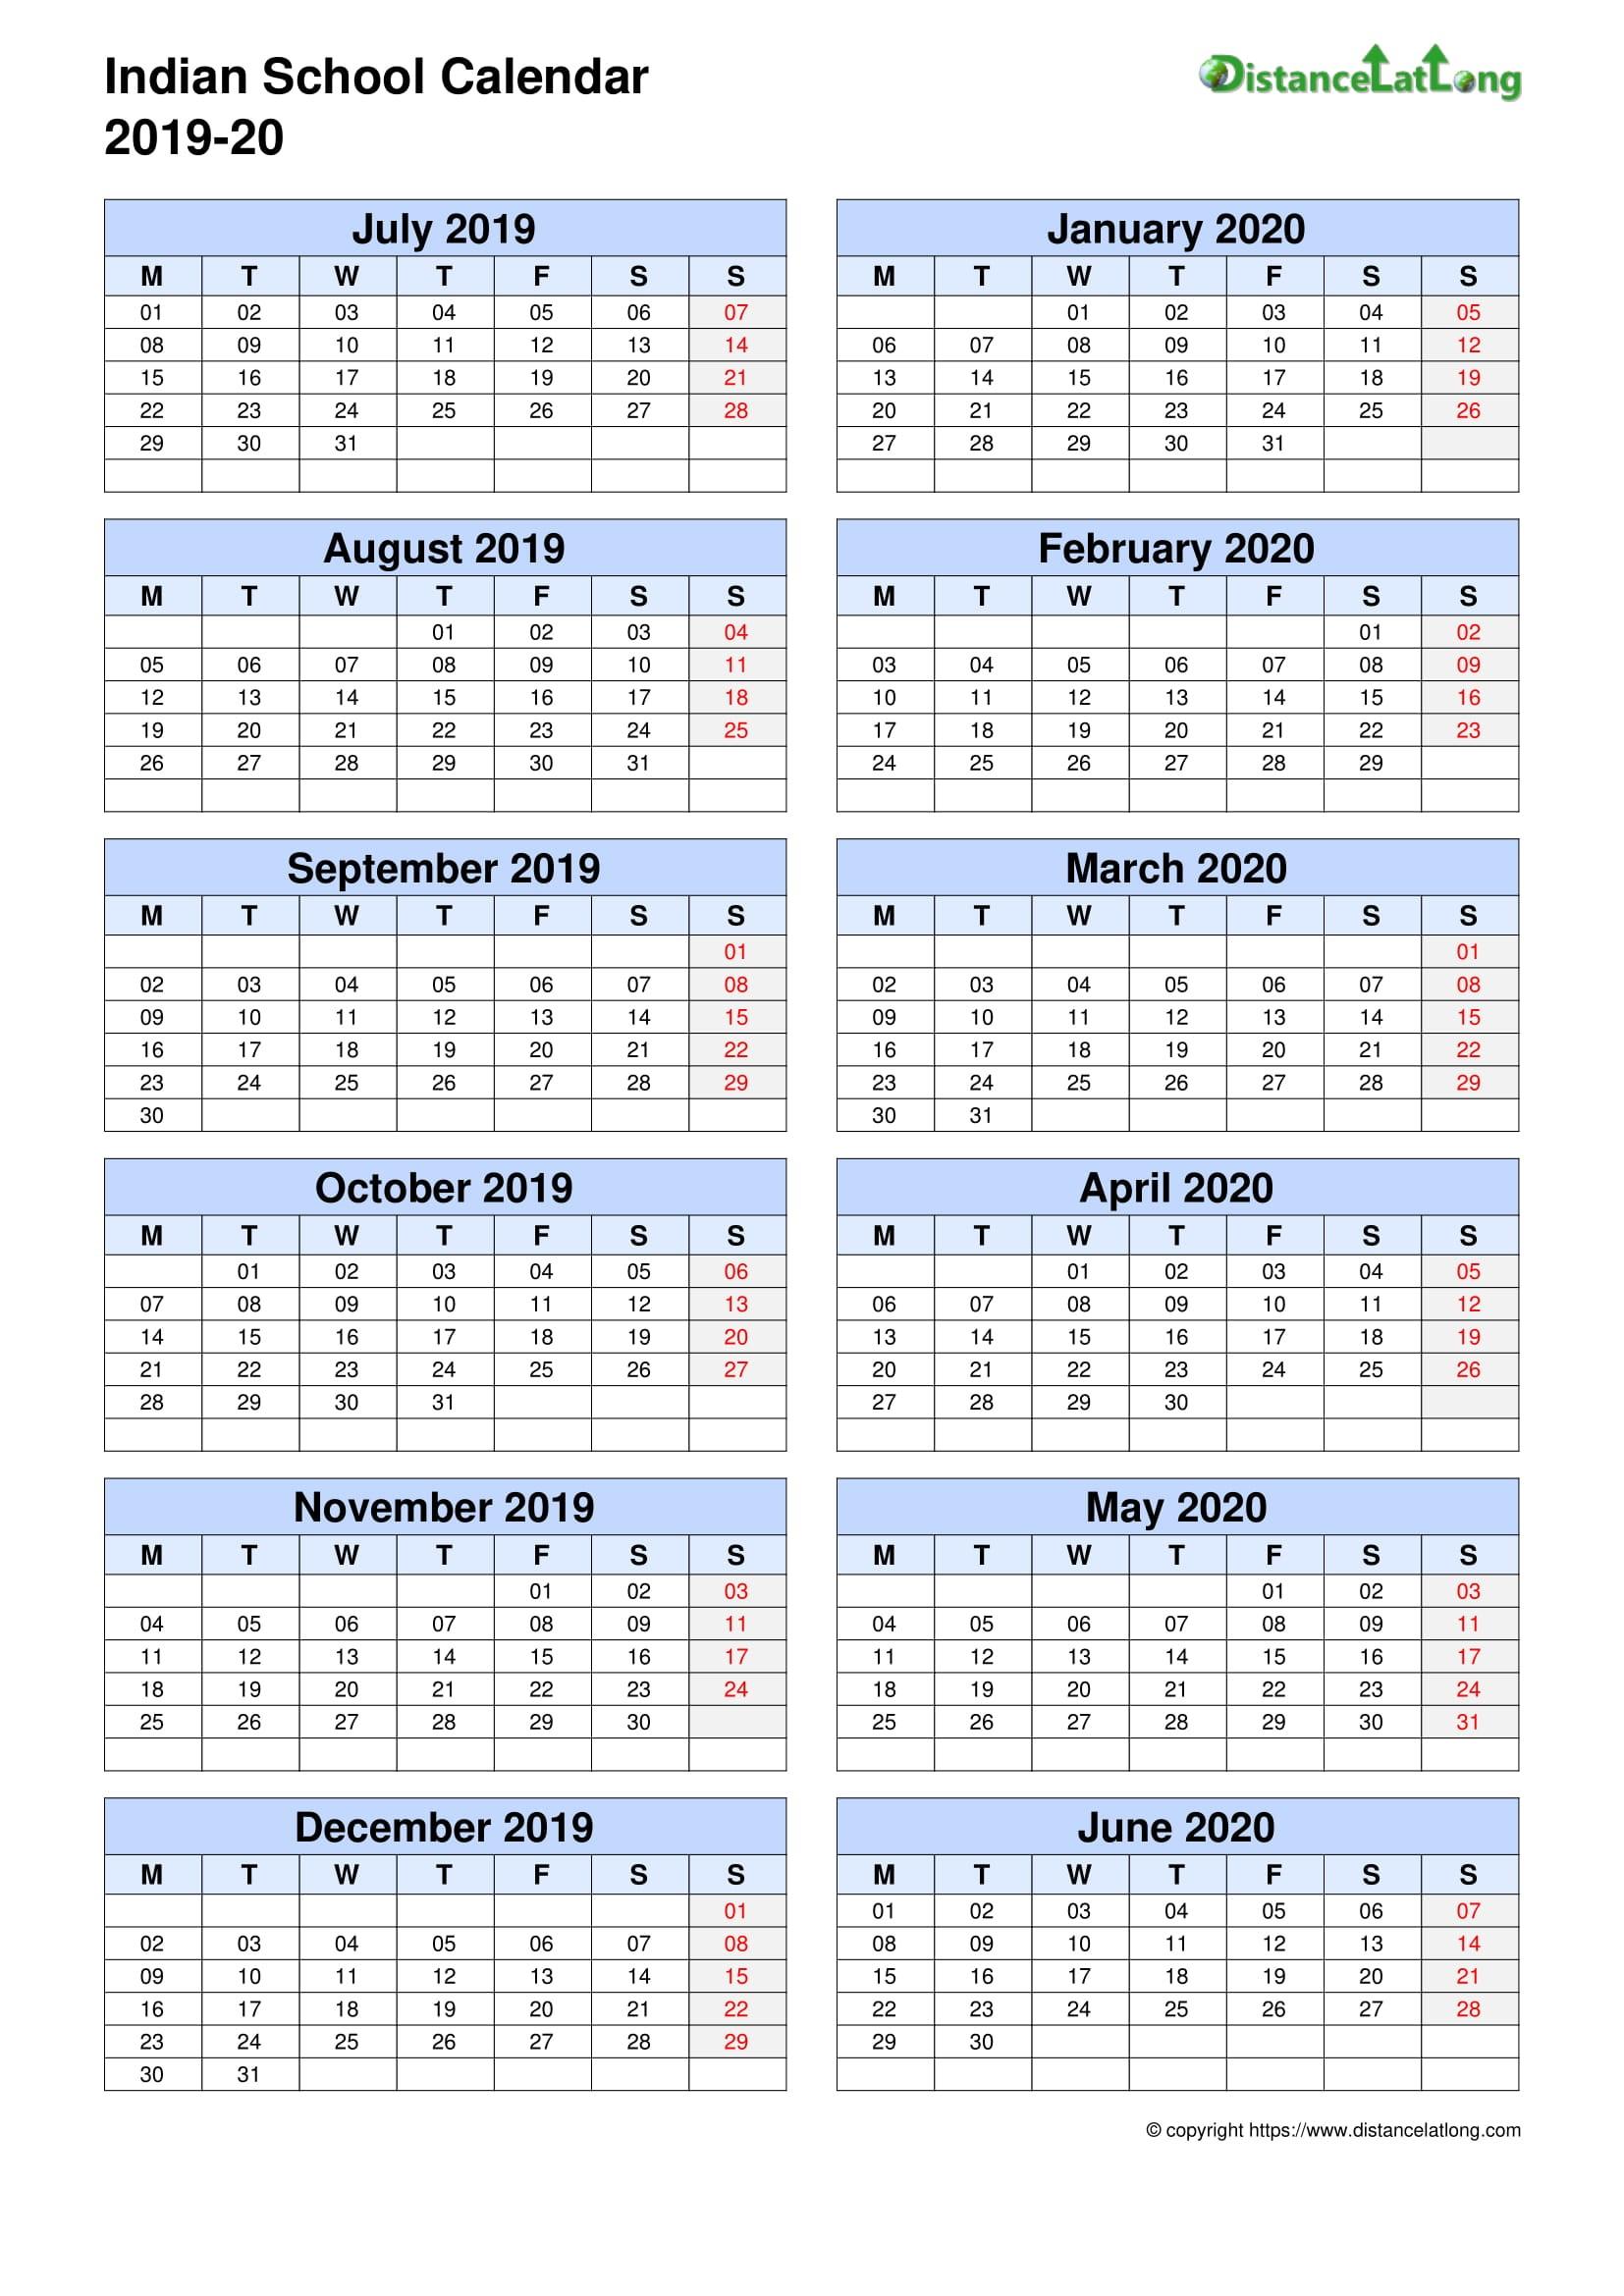 009 Remarkable School Year Calendar Template High Def  Excel 2019-20 WordFull